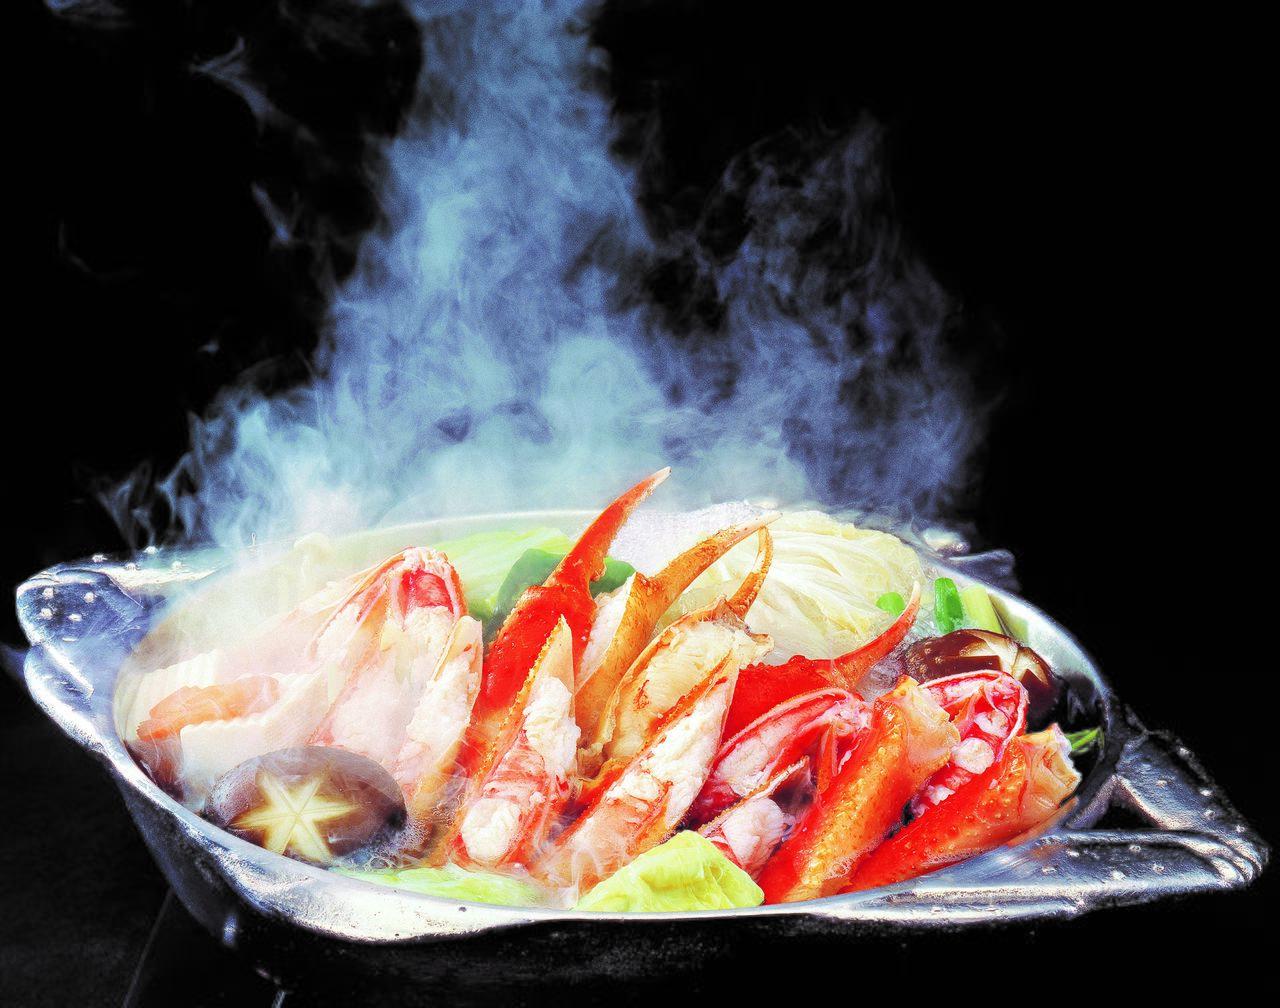 Кани-суки – популярное блюдо ресторана «Кани дораку» (Предоставлено «Кани дораку»)